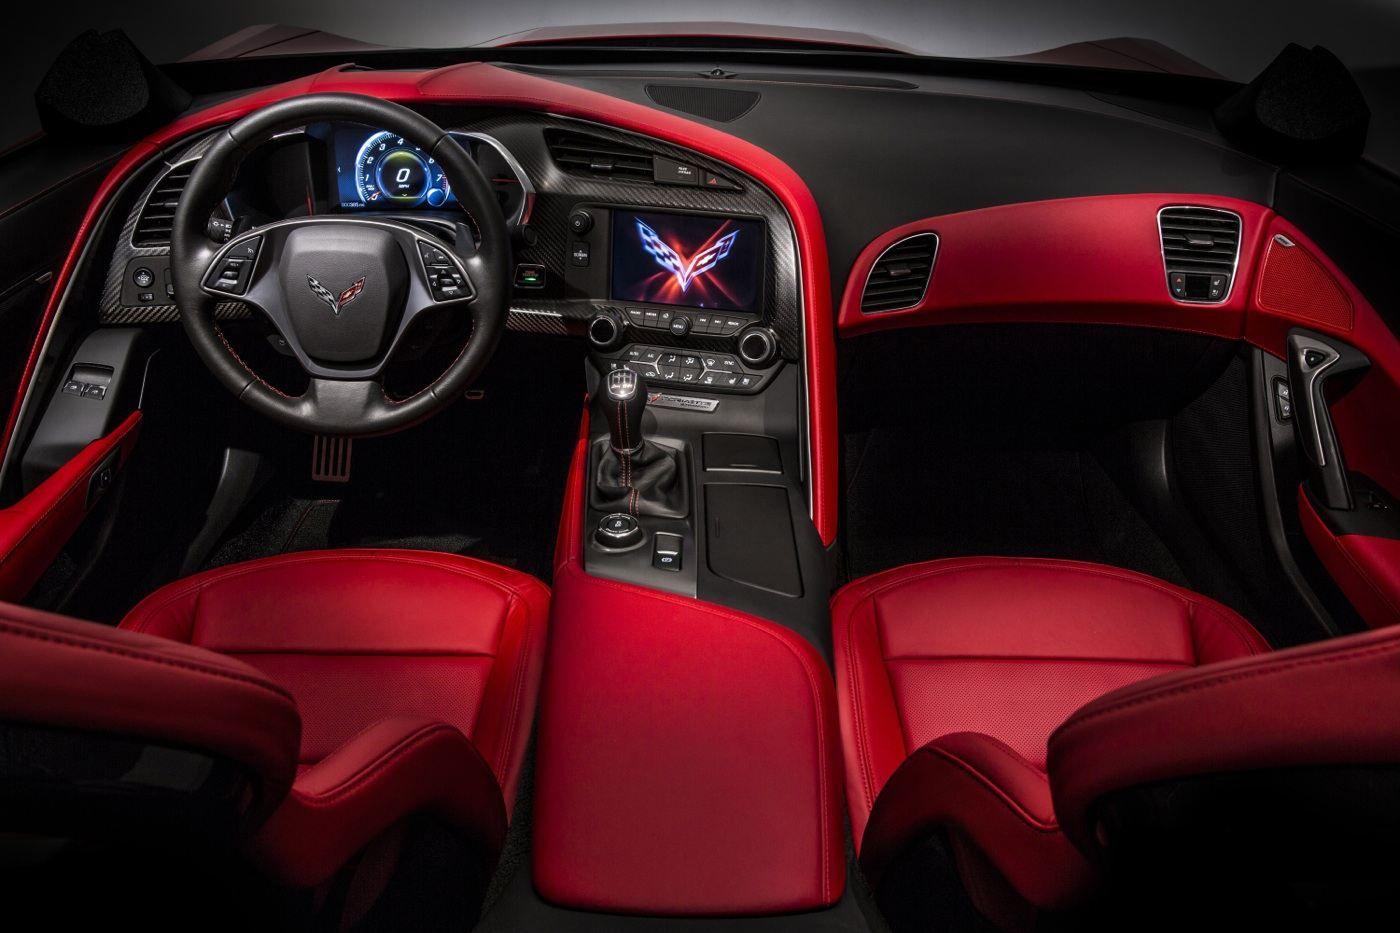 2020 Honda CRV Review & Guide Chevrolet corvette